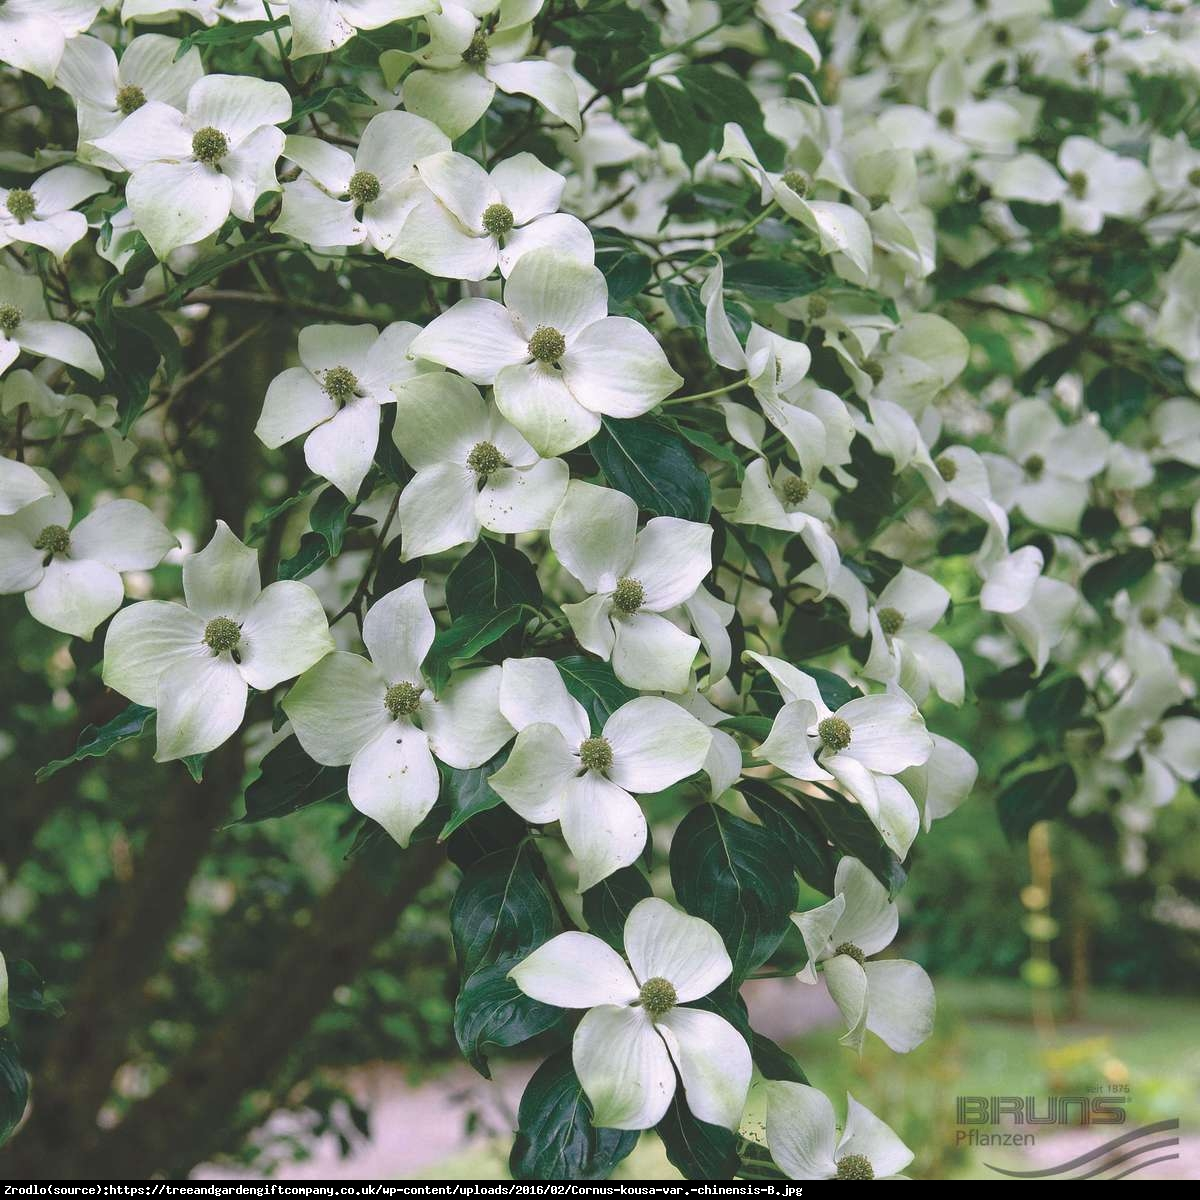 Dereń kousa odmiana chińska P9 - Cornus kousa var. chinensis